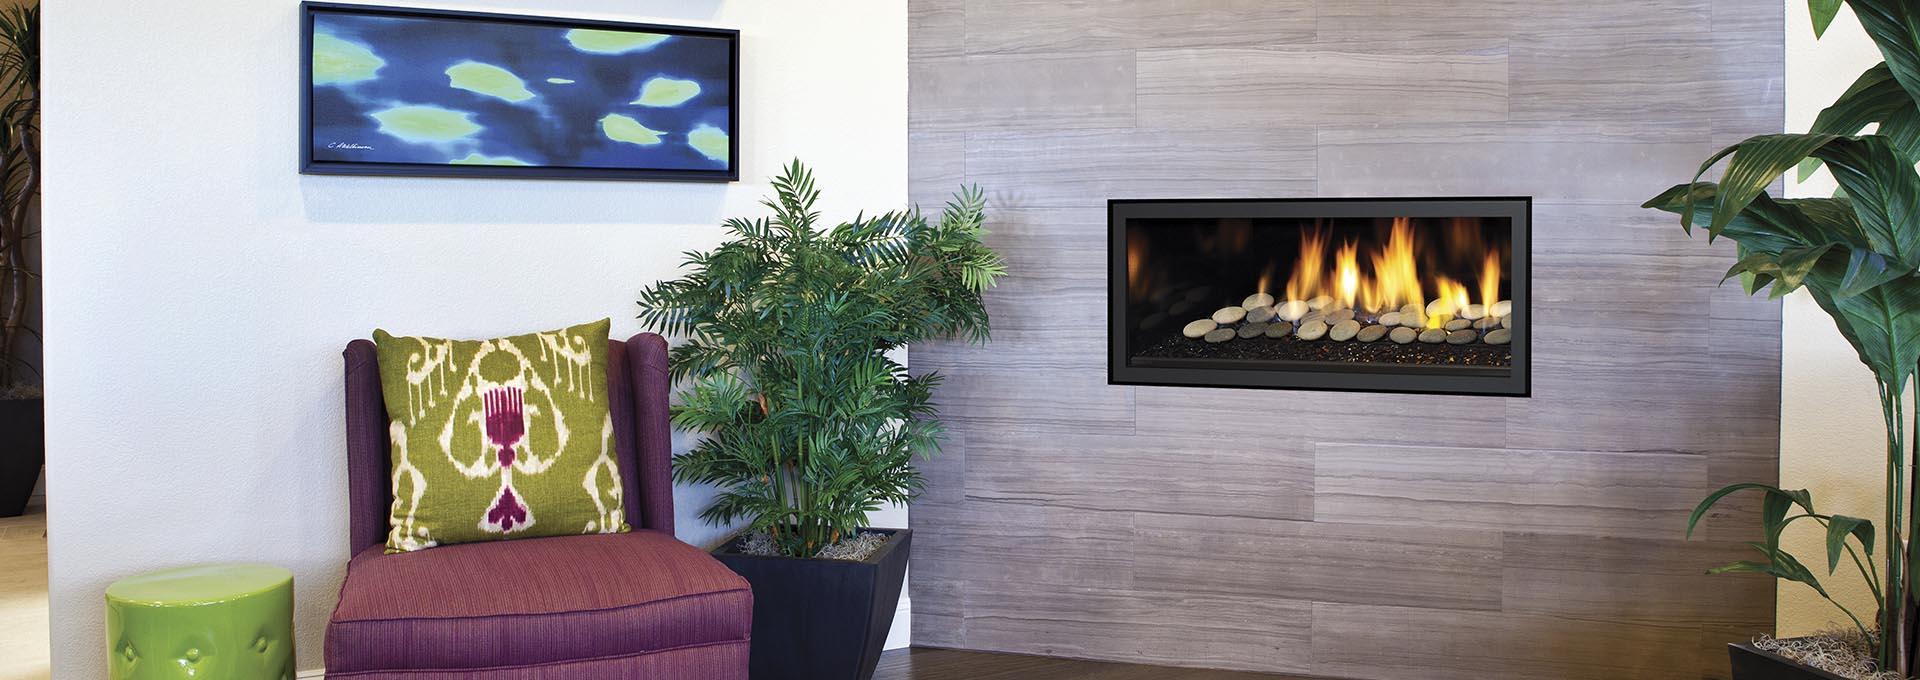 Modern Gas Fireplace Greenfire Gf900c Regency Fireplace Products